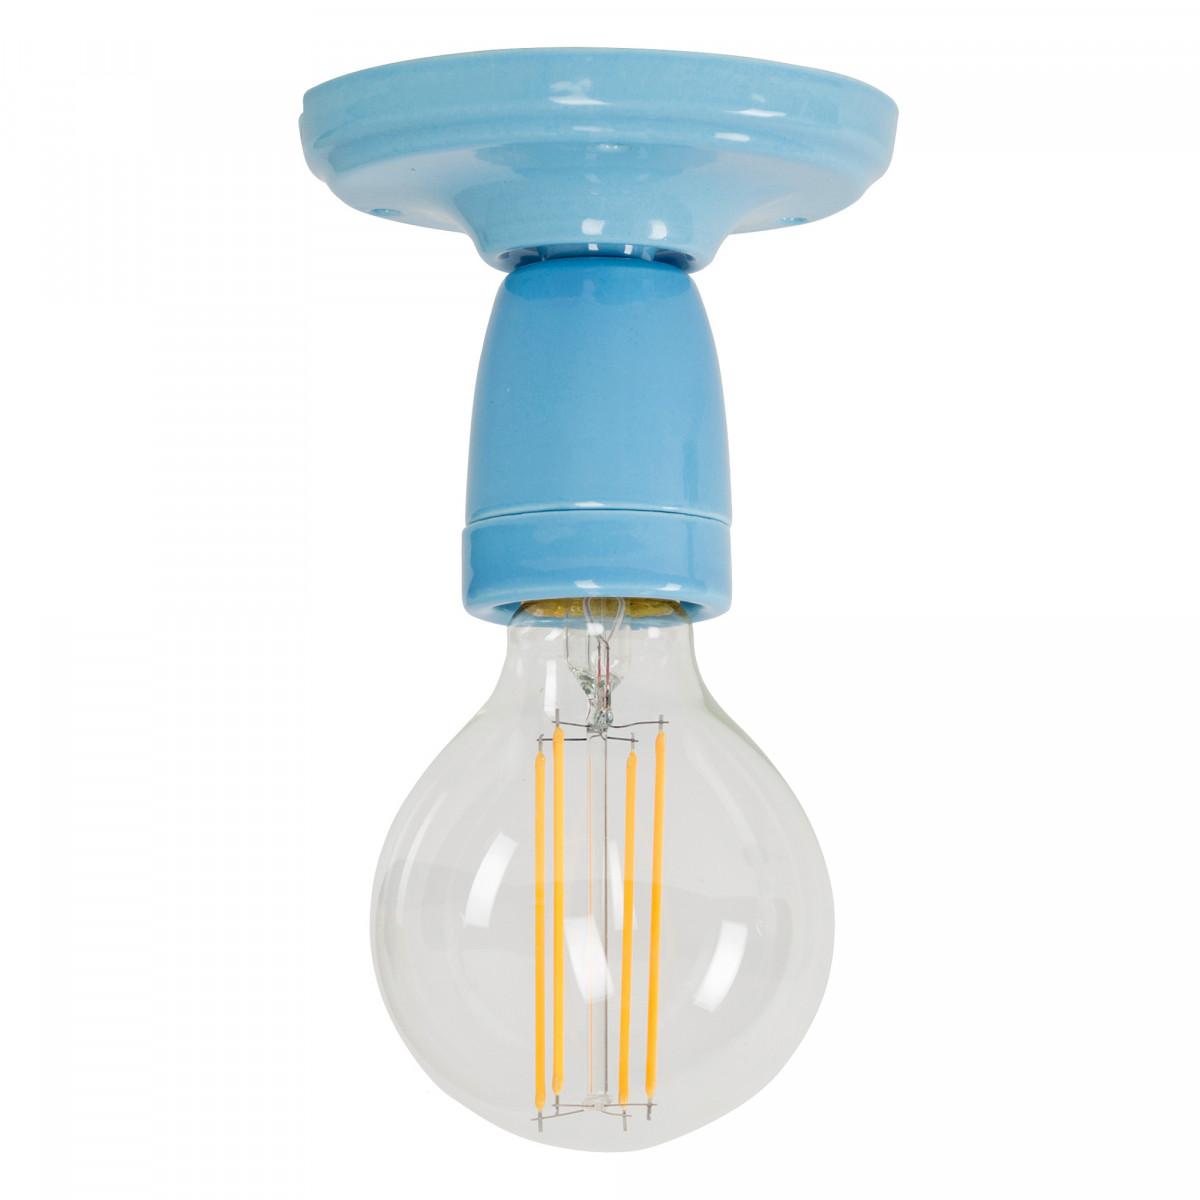 Retro plafondlamp Mir blauw